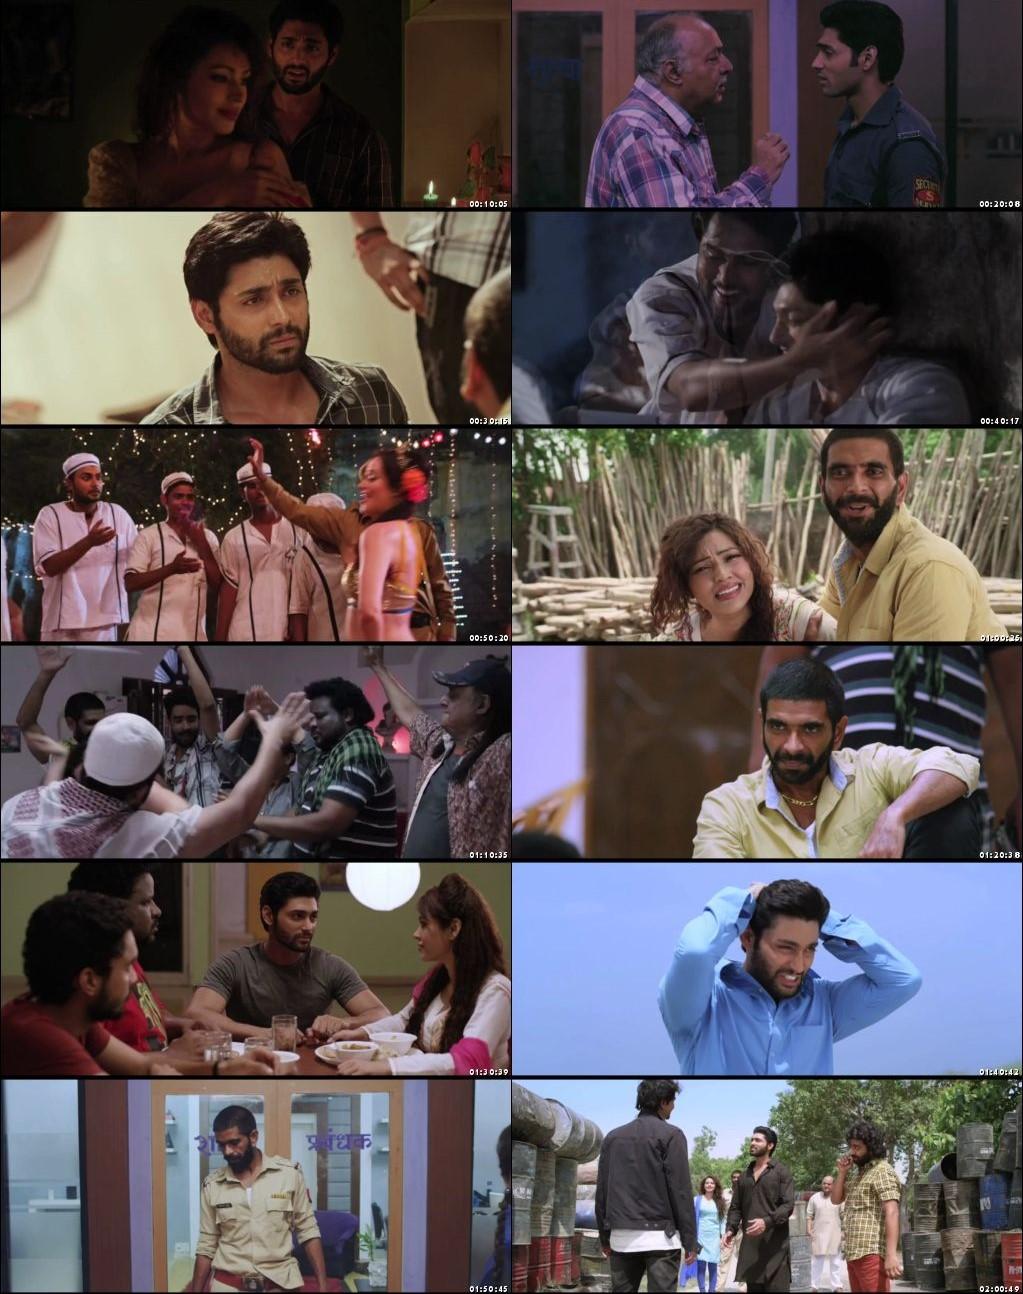 Khel Toh Ab Shuru Hoga 2016 Full Hindi Movie Online Watch